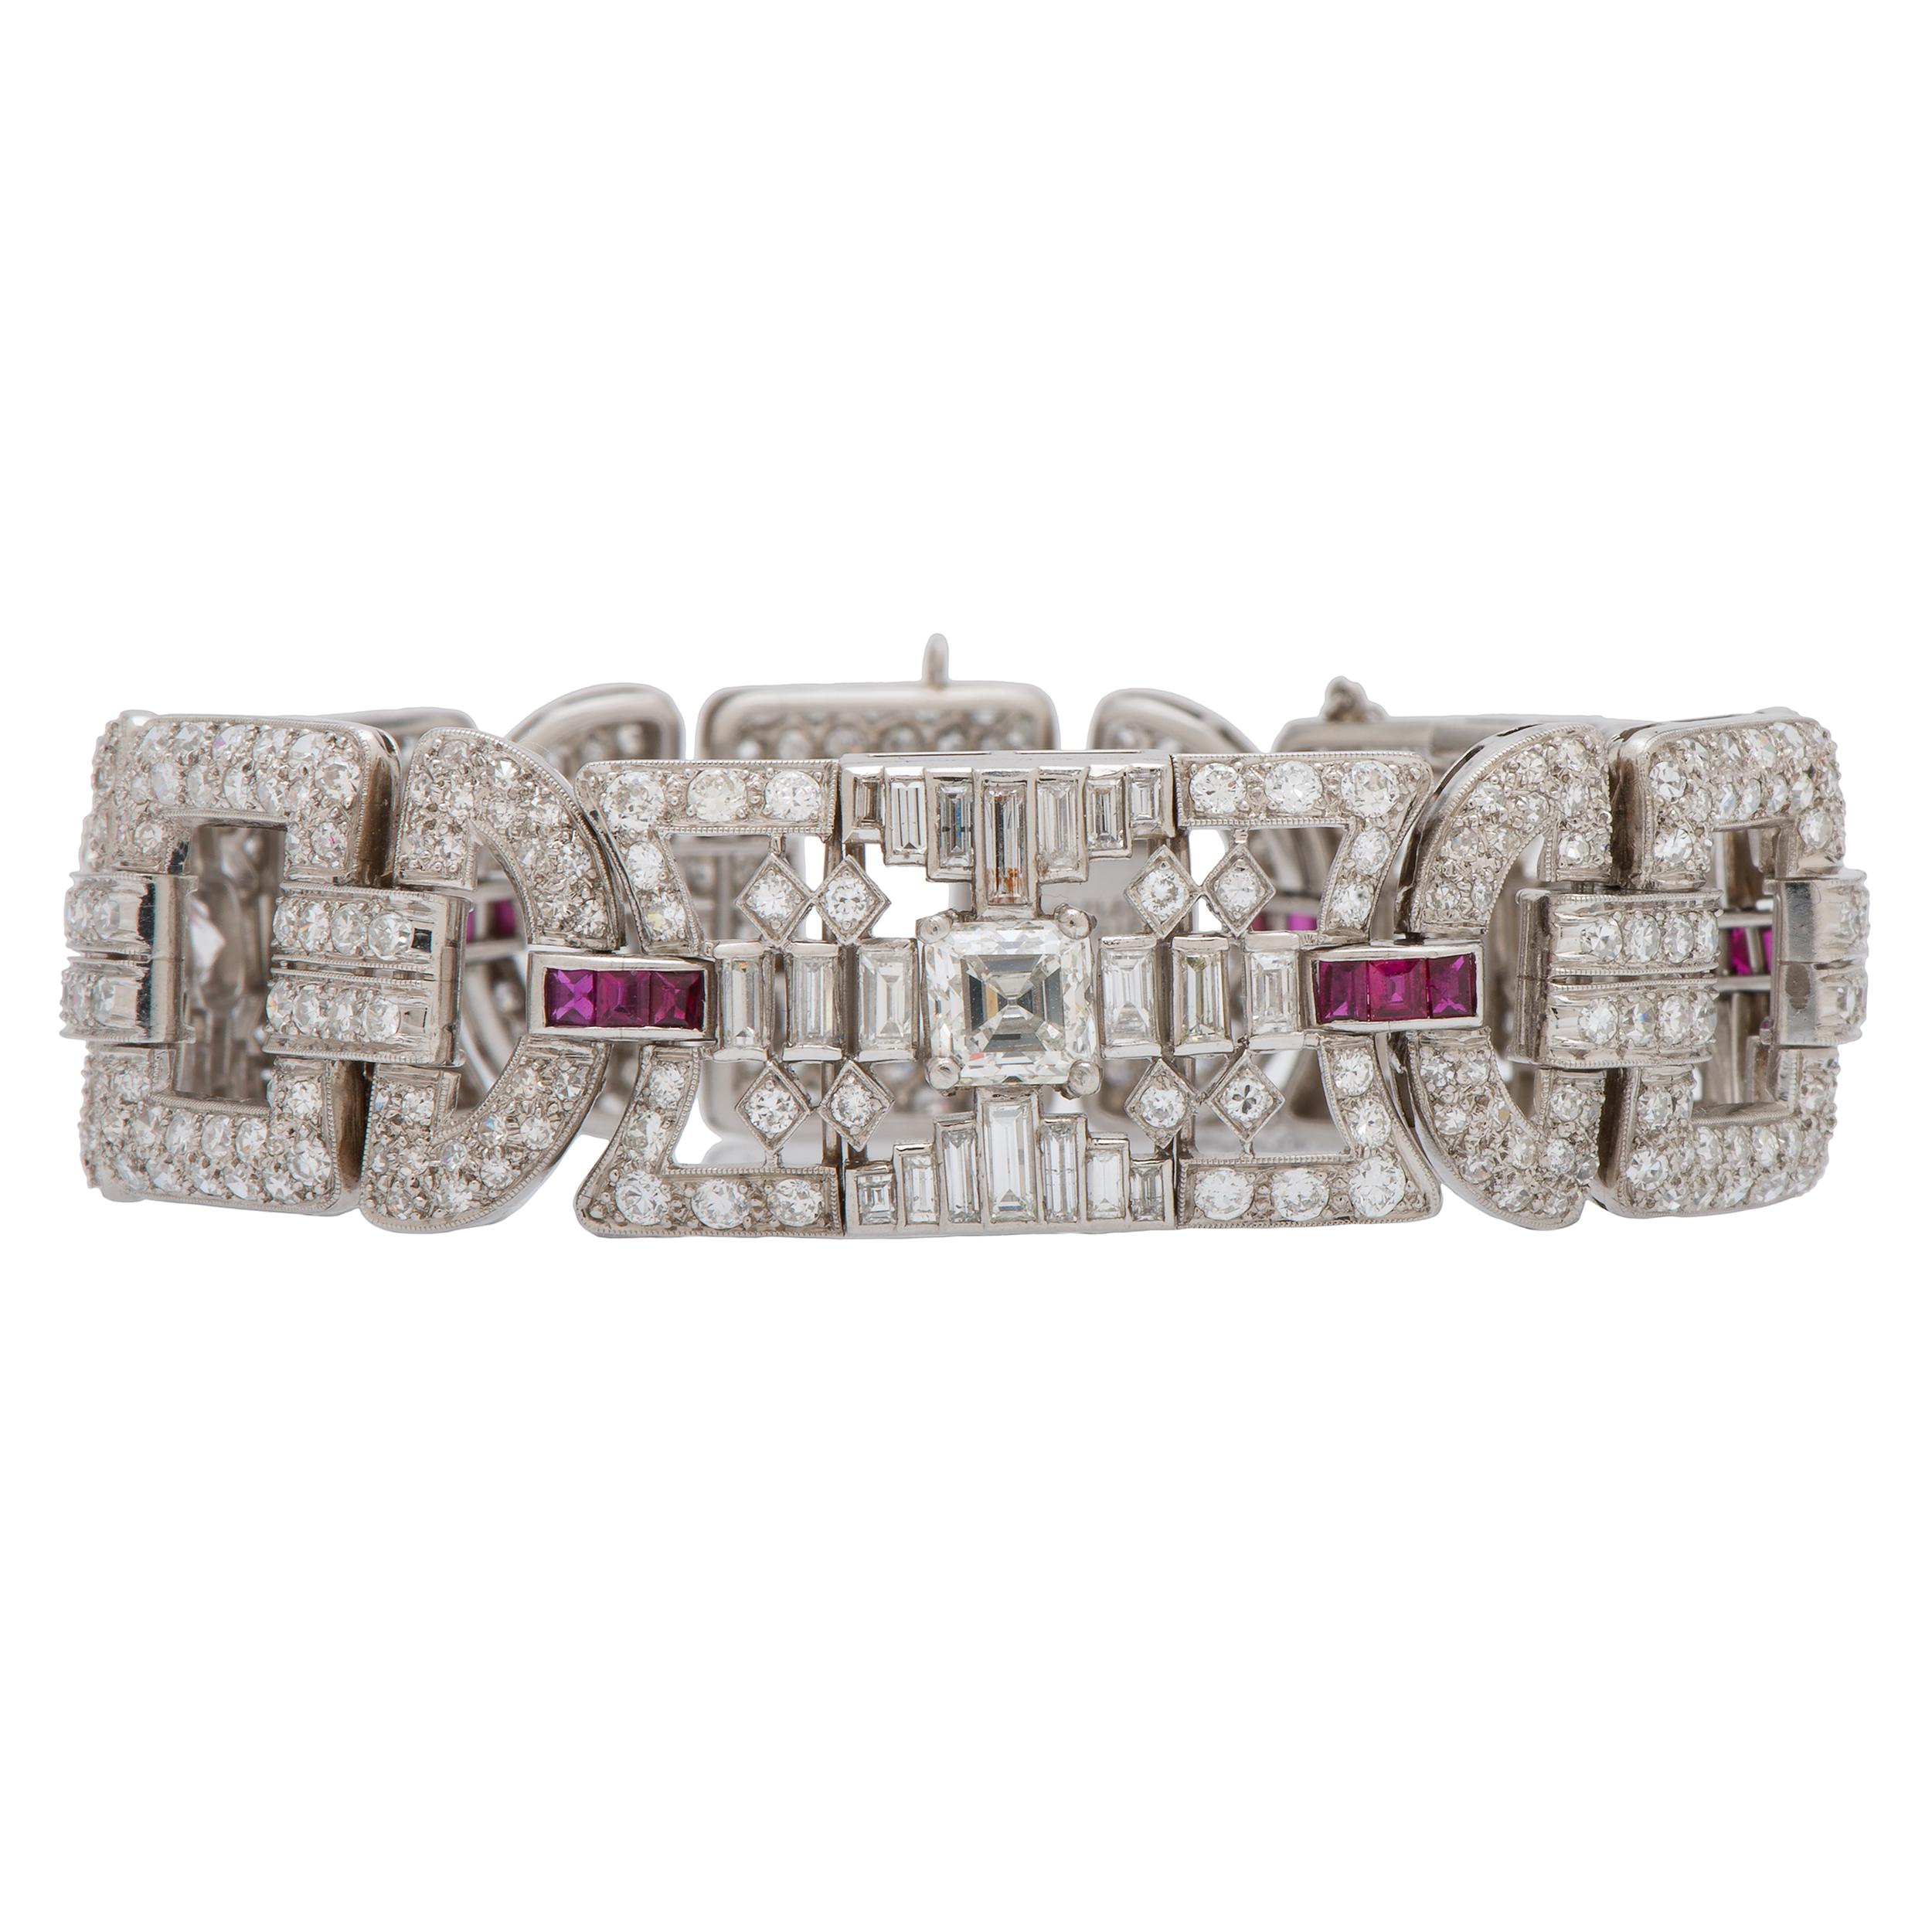 3f72d987000e1 Tiffany & Co. Art-Deco Diamond and Ruby Bracelet in Platinum Ca ...